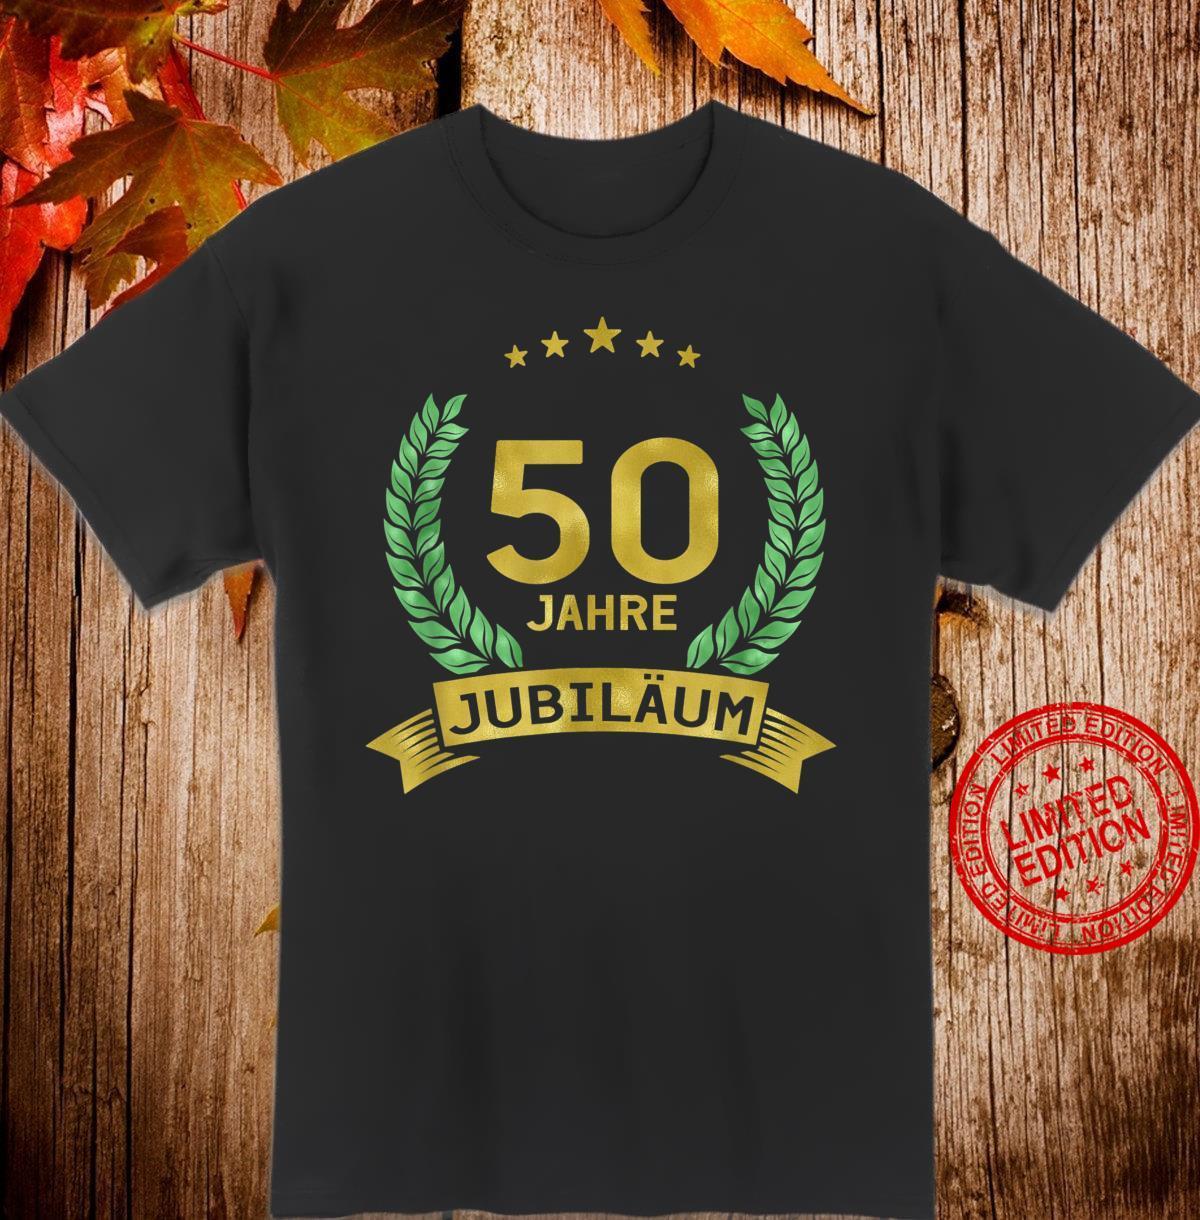 50 Jahre Jubiläum Firmenjubiläum Firma Arbeit Ehe Geschenk Shirt